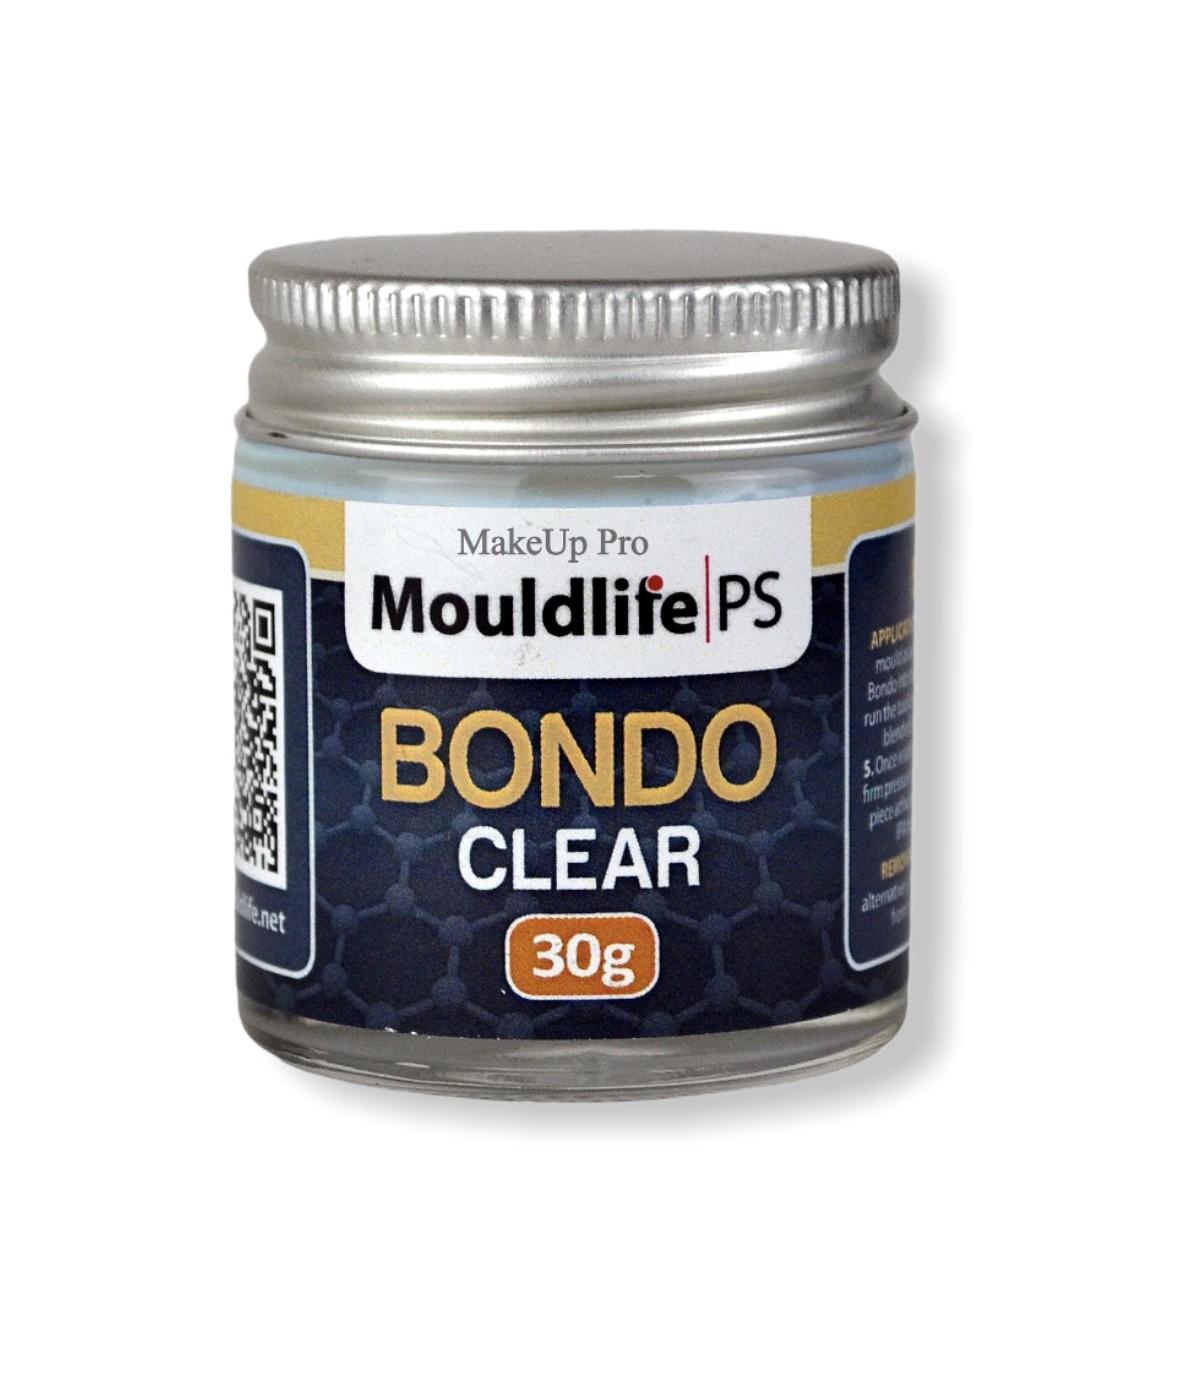 Bondo, clear 30g